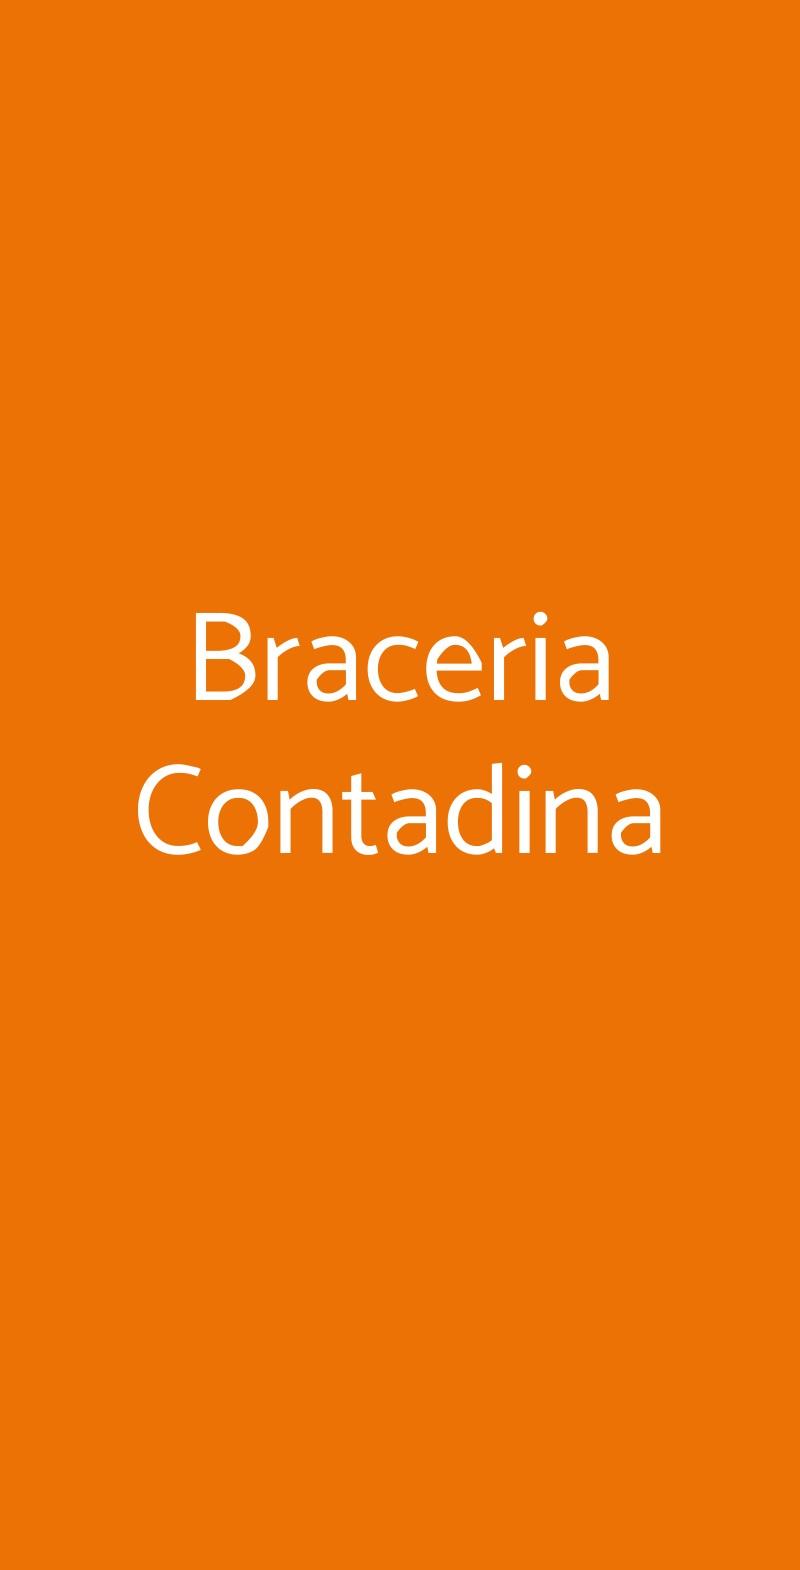 Braceria Contadina Marcaria menù 1 pagina